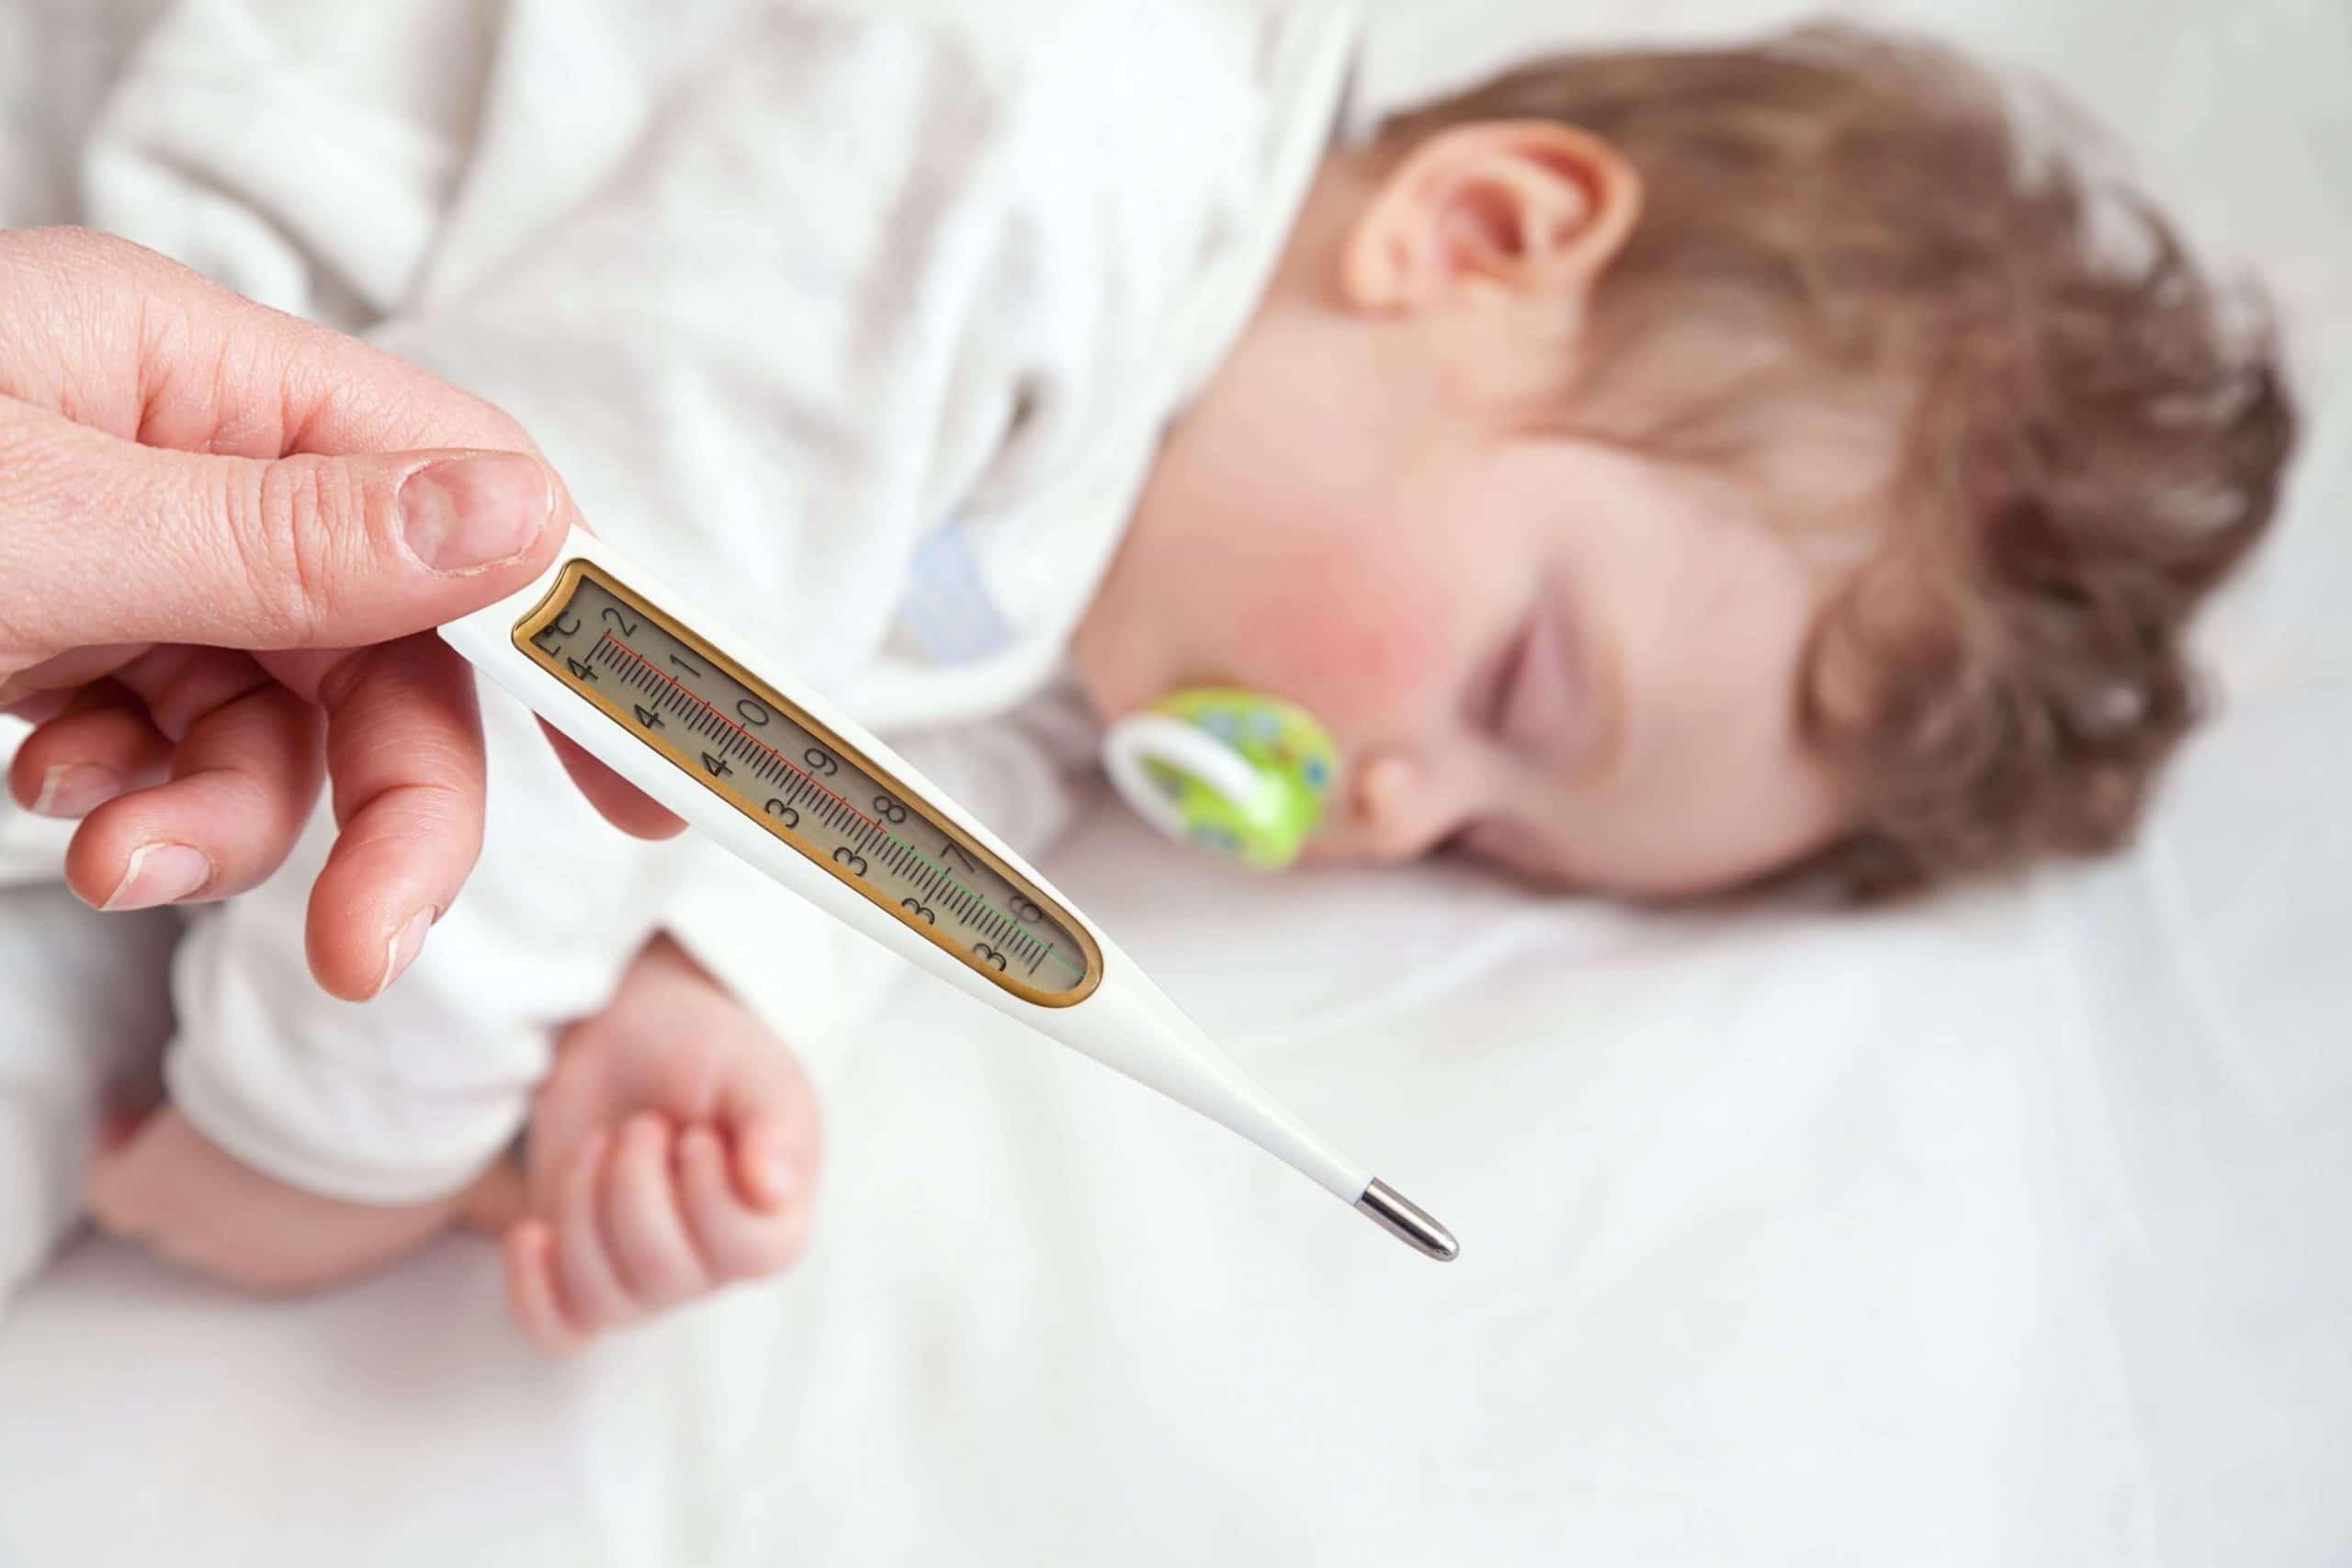 ребенок спит, мама измеряет температуру